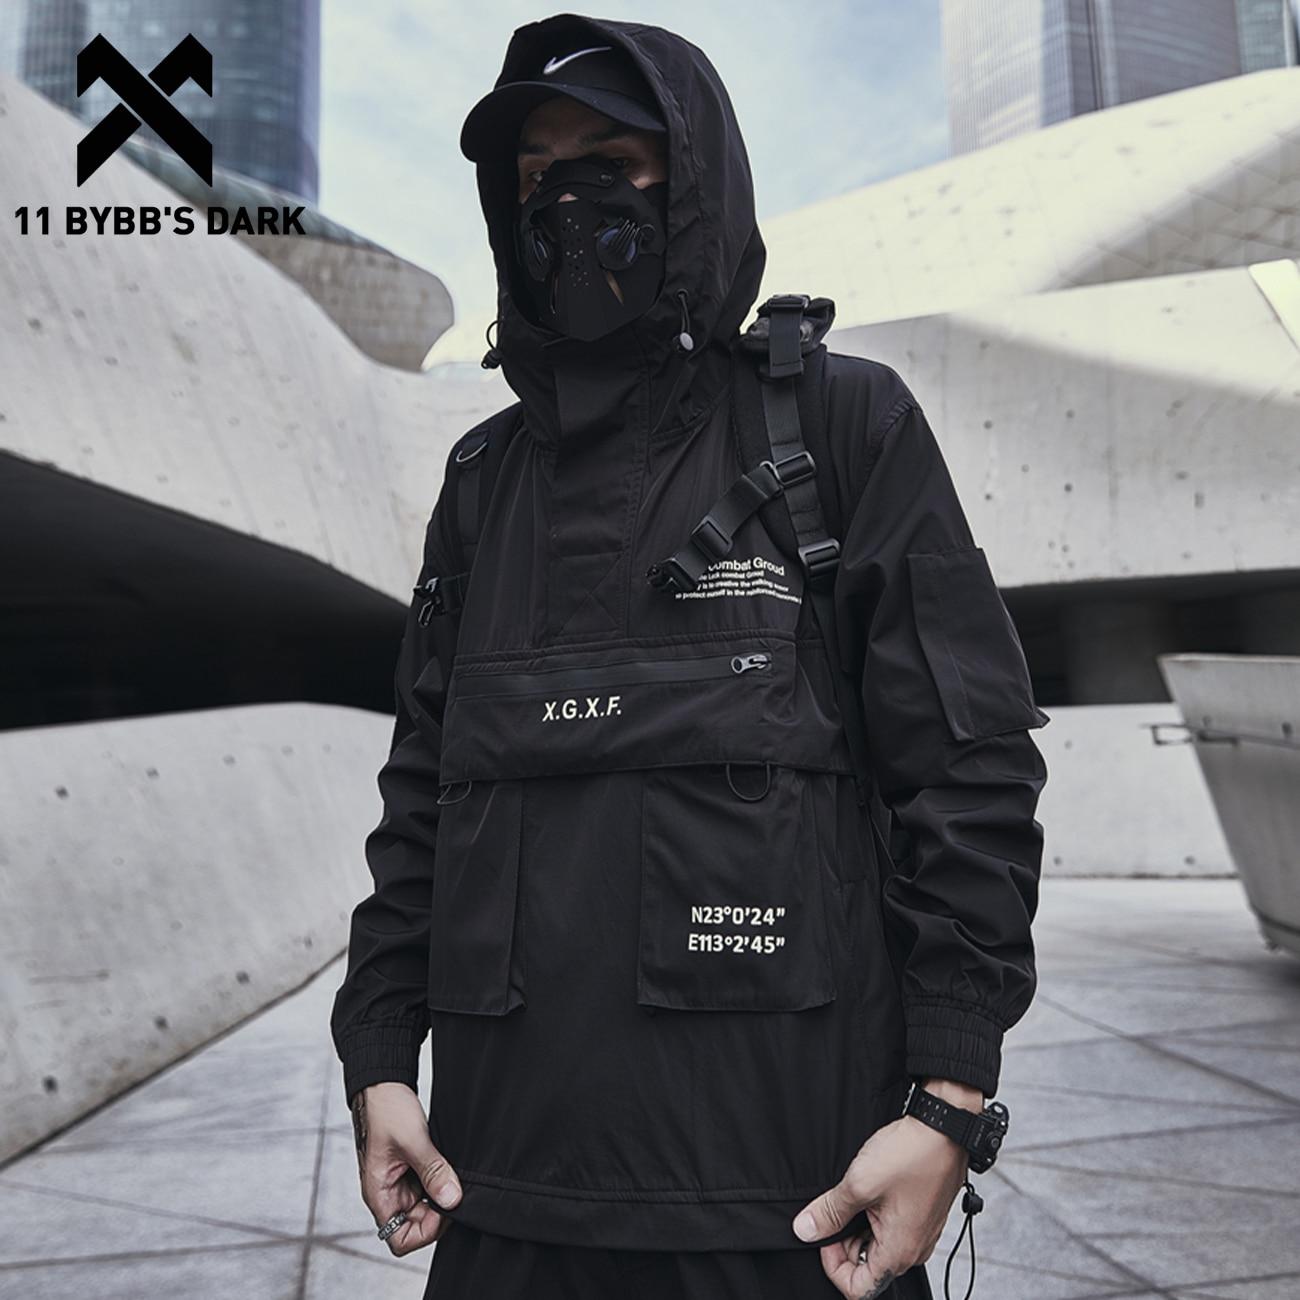 11 BYBB'S DARK Dark Cargo Jackets Coats Streetwear Tactical Function Pullover Harajuku Multi-pocket Hoody Windbreaker Coats